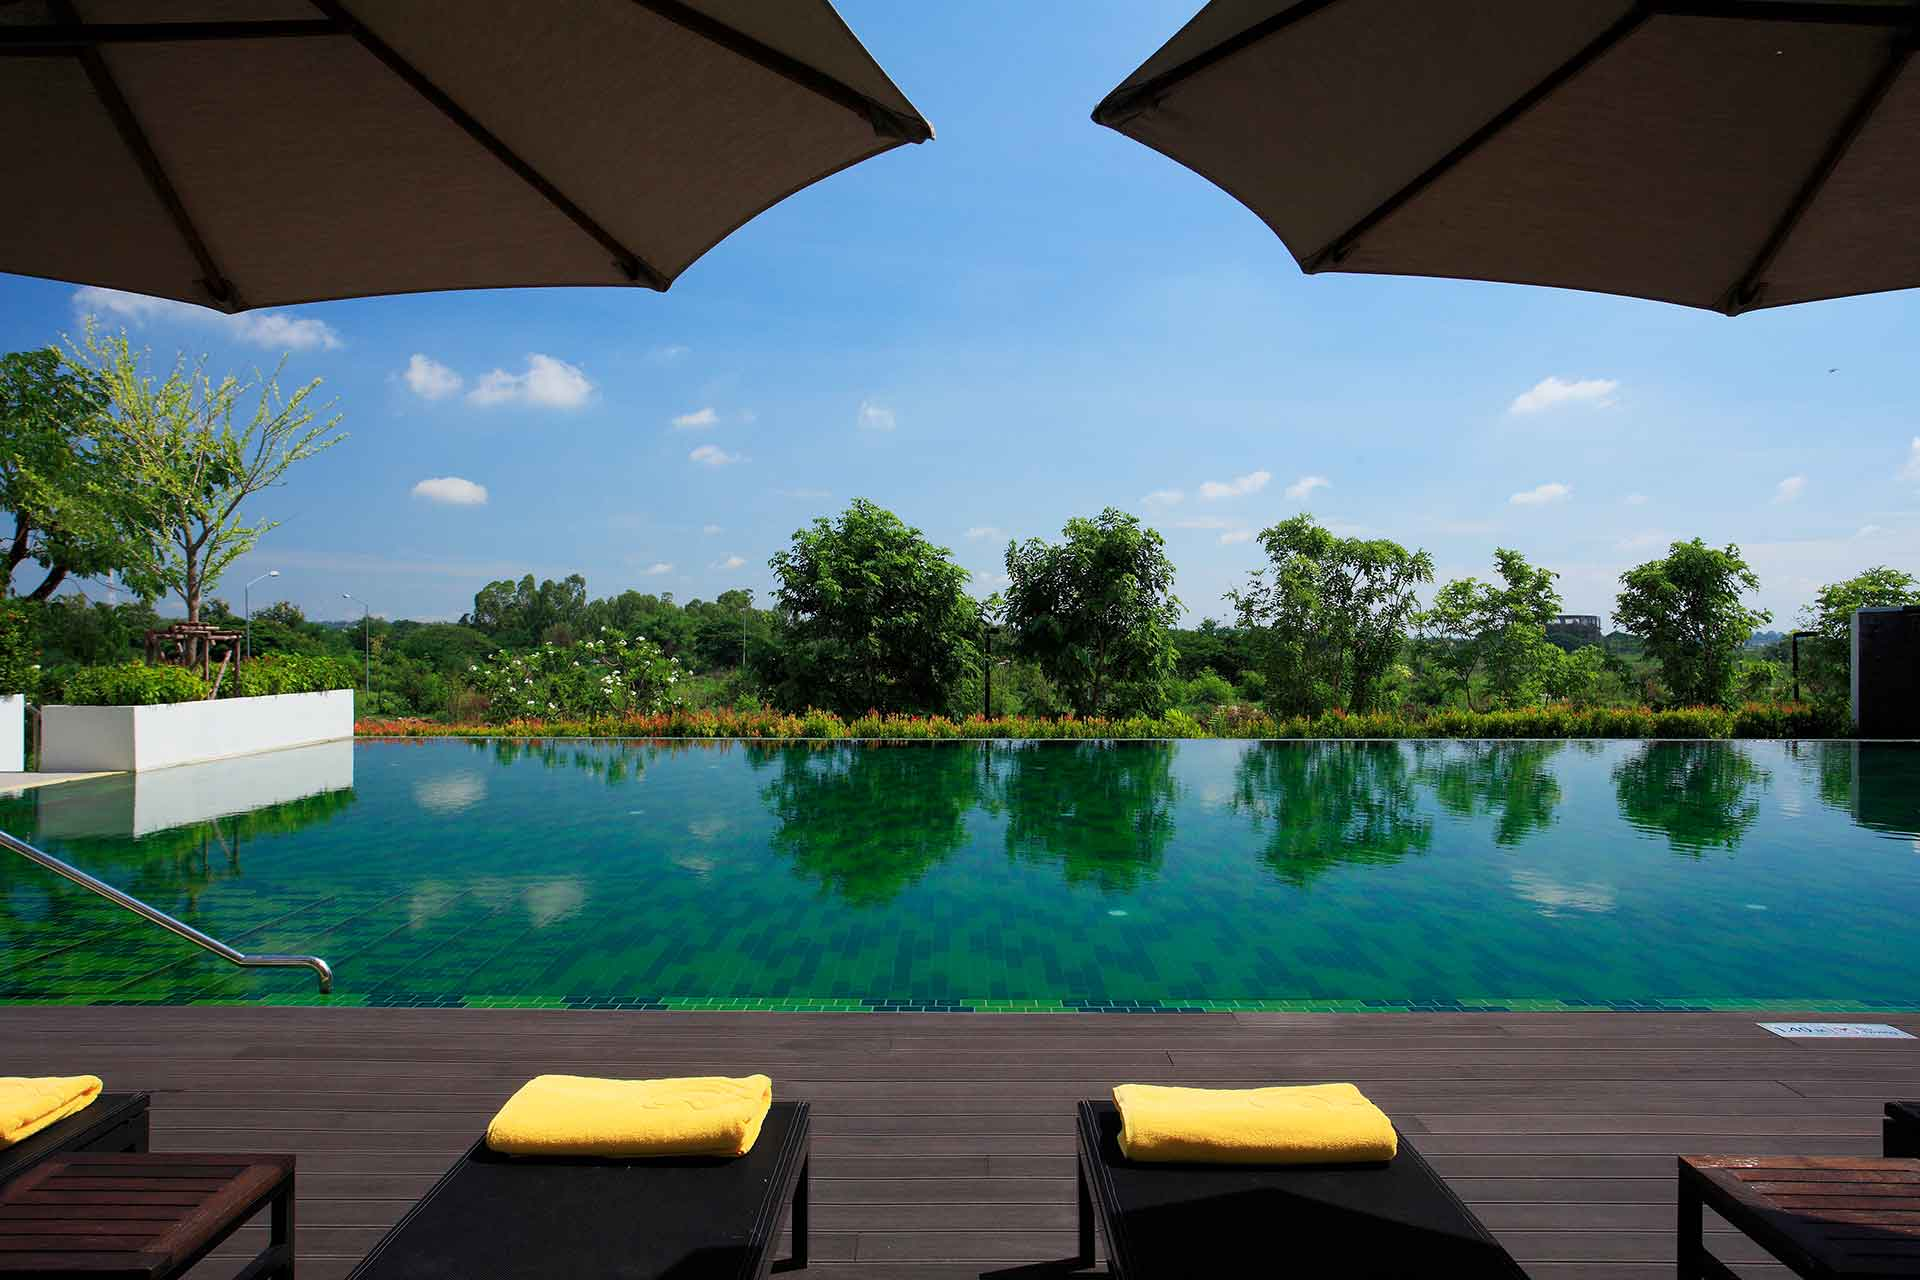 Photo gallery of AVANI Khon Kaen hotel & convention centre, Pool image